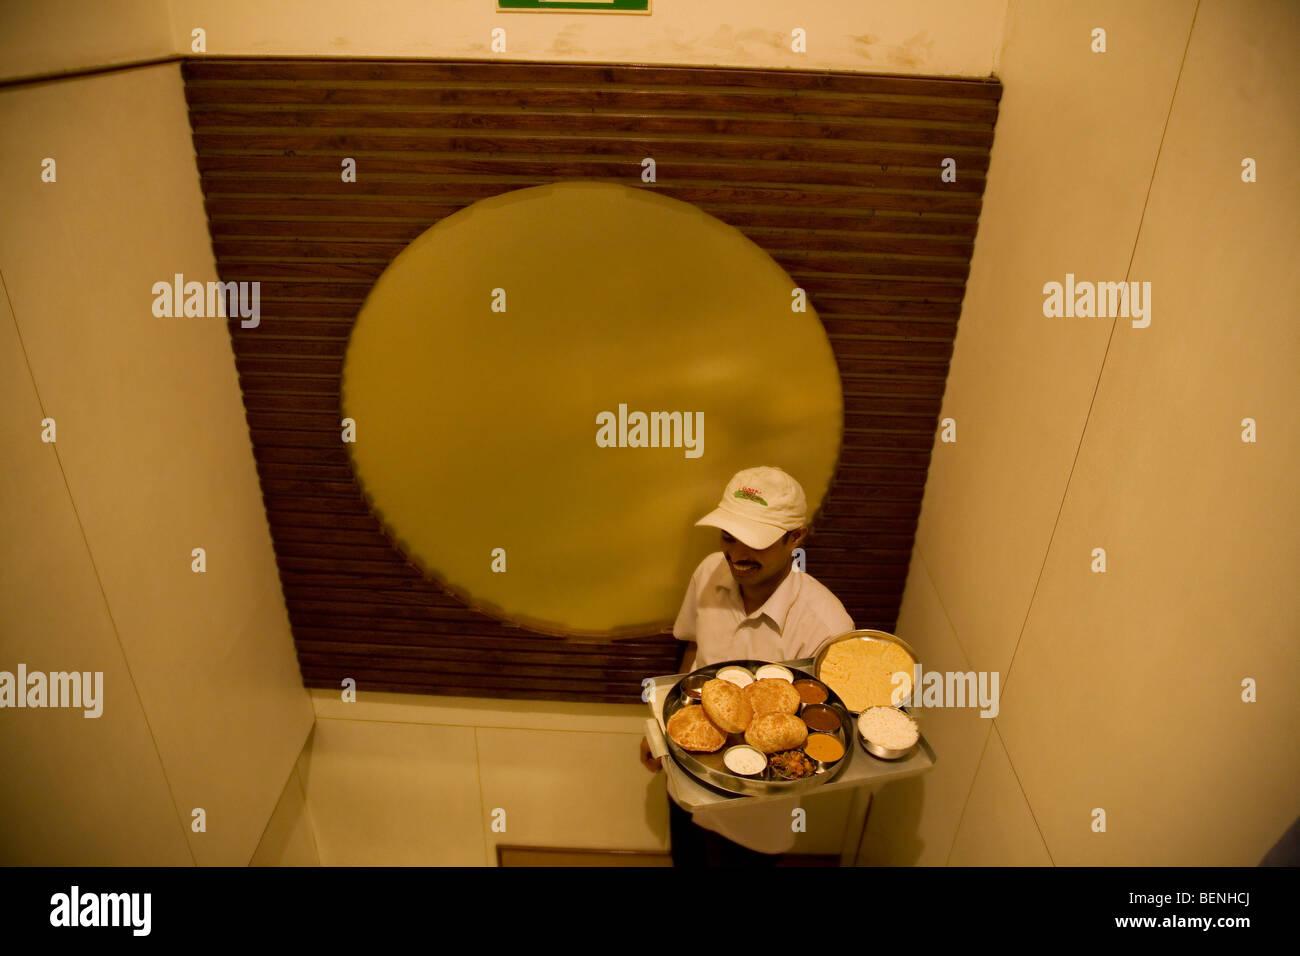 Sagar Ratna Restaurant in Defence Colony Delhi India - Stock Image